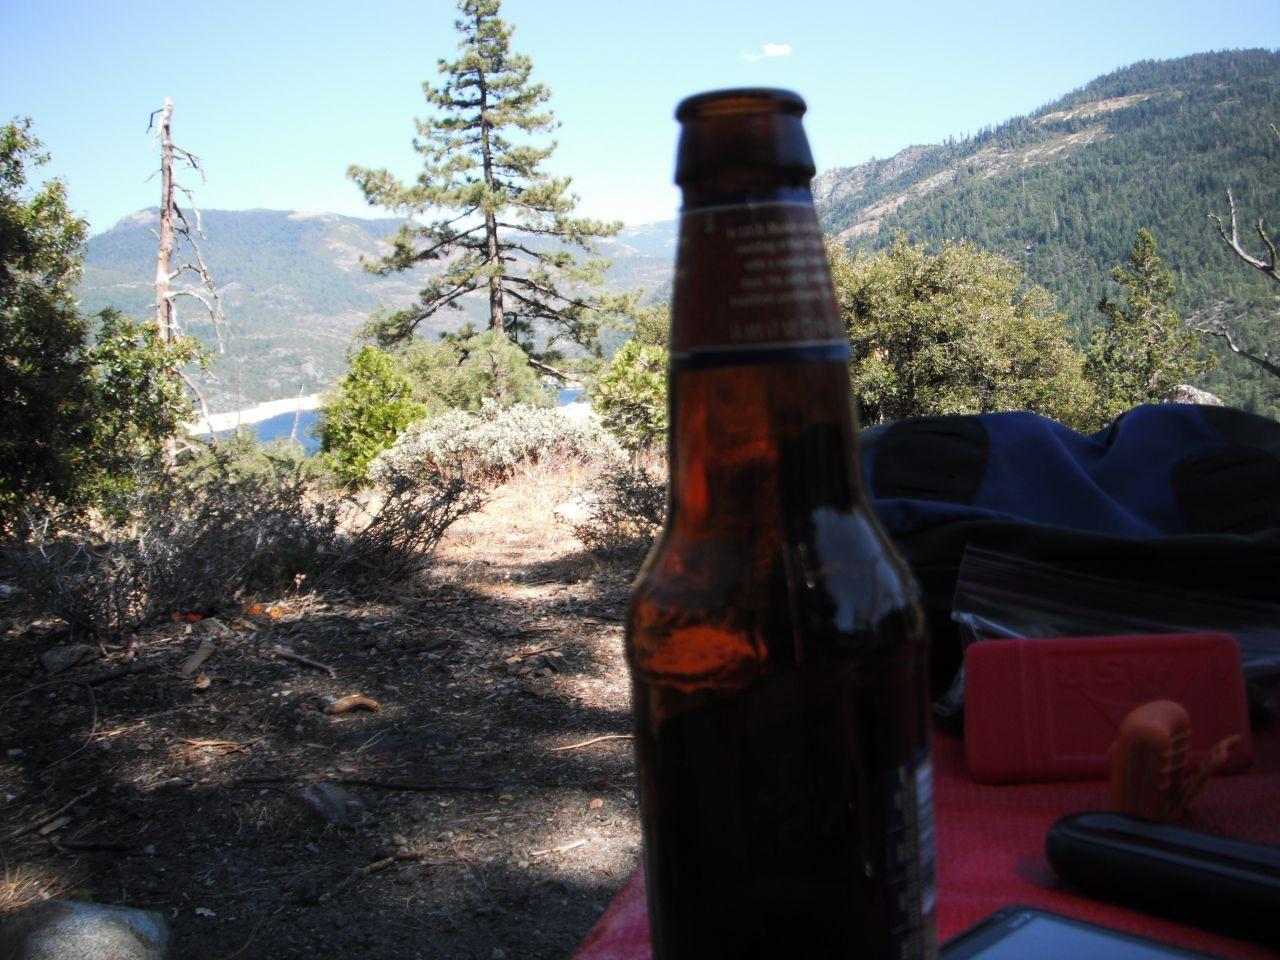 Post Drive Beverage